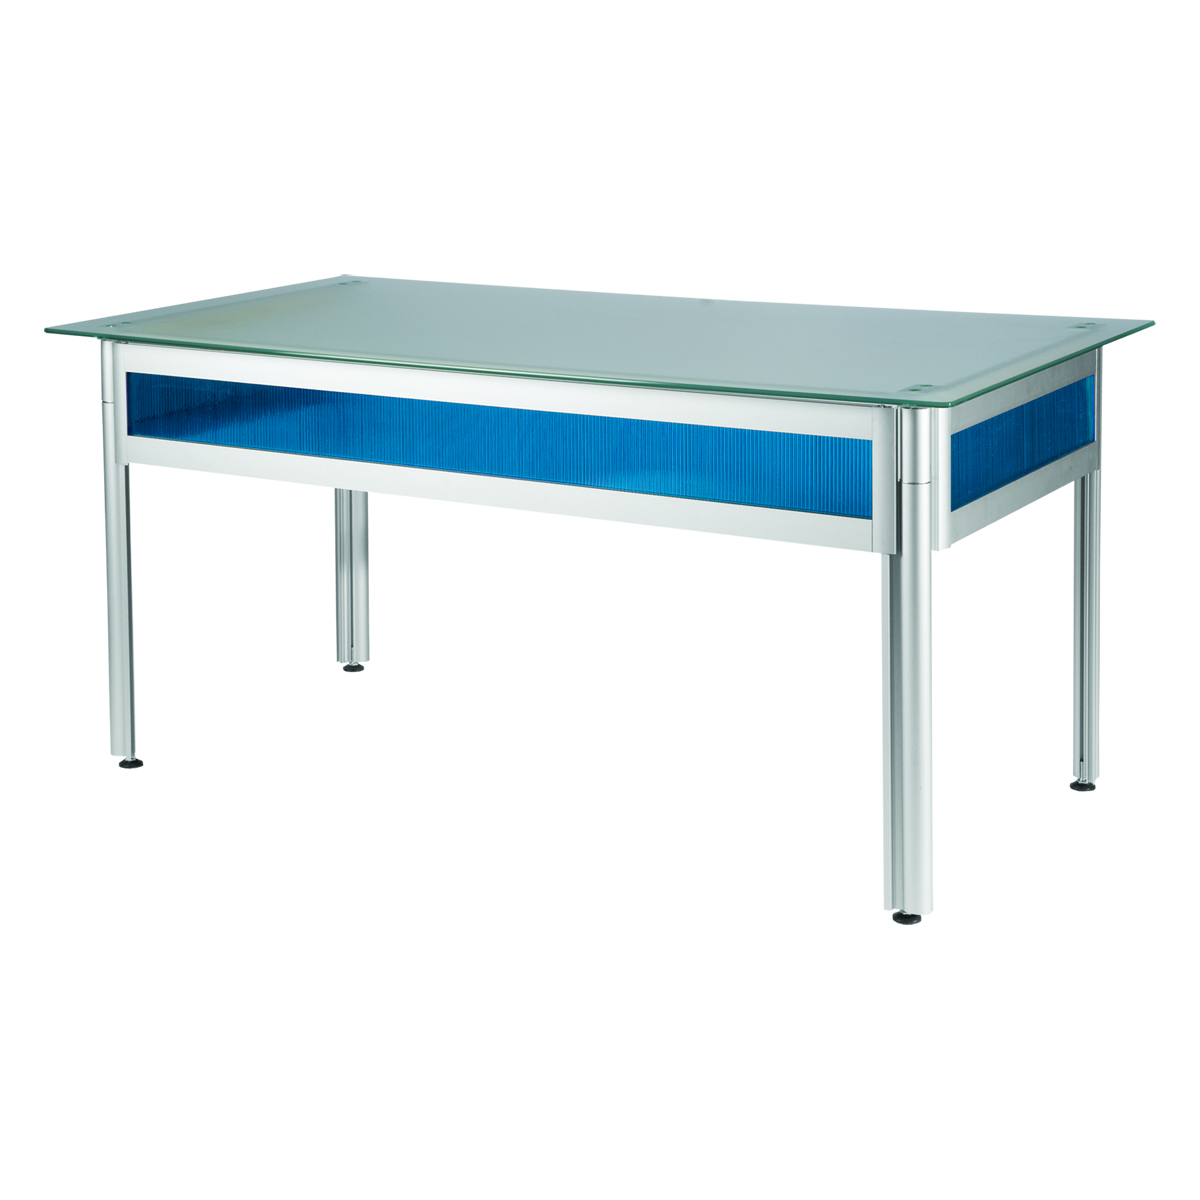 bureau flashy bleu plateau verre opaque 150x80 internation moduling. Black Bedroom Furniture Sets. Home Design Ideas